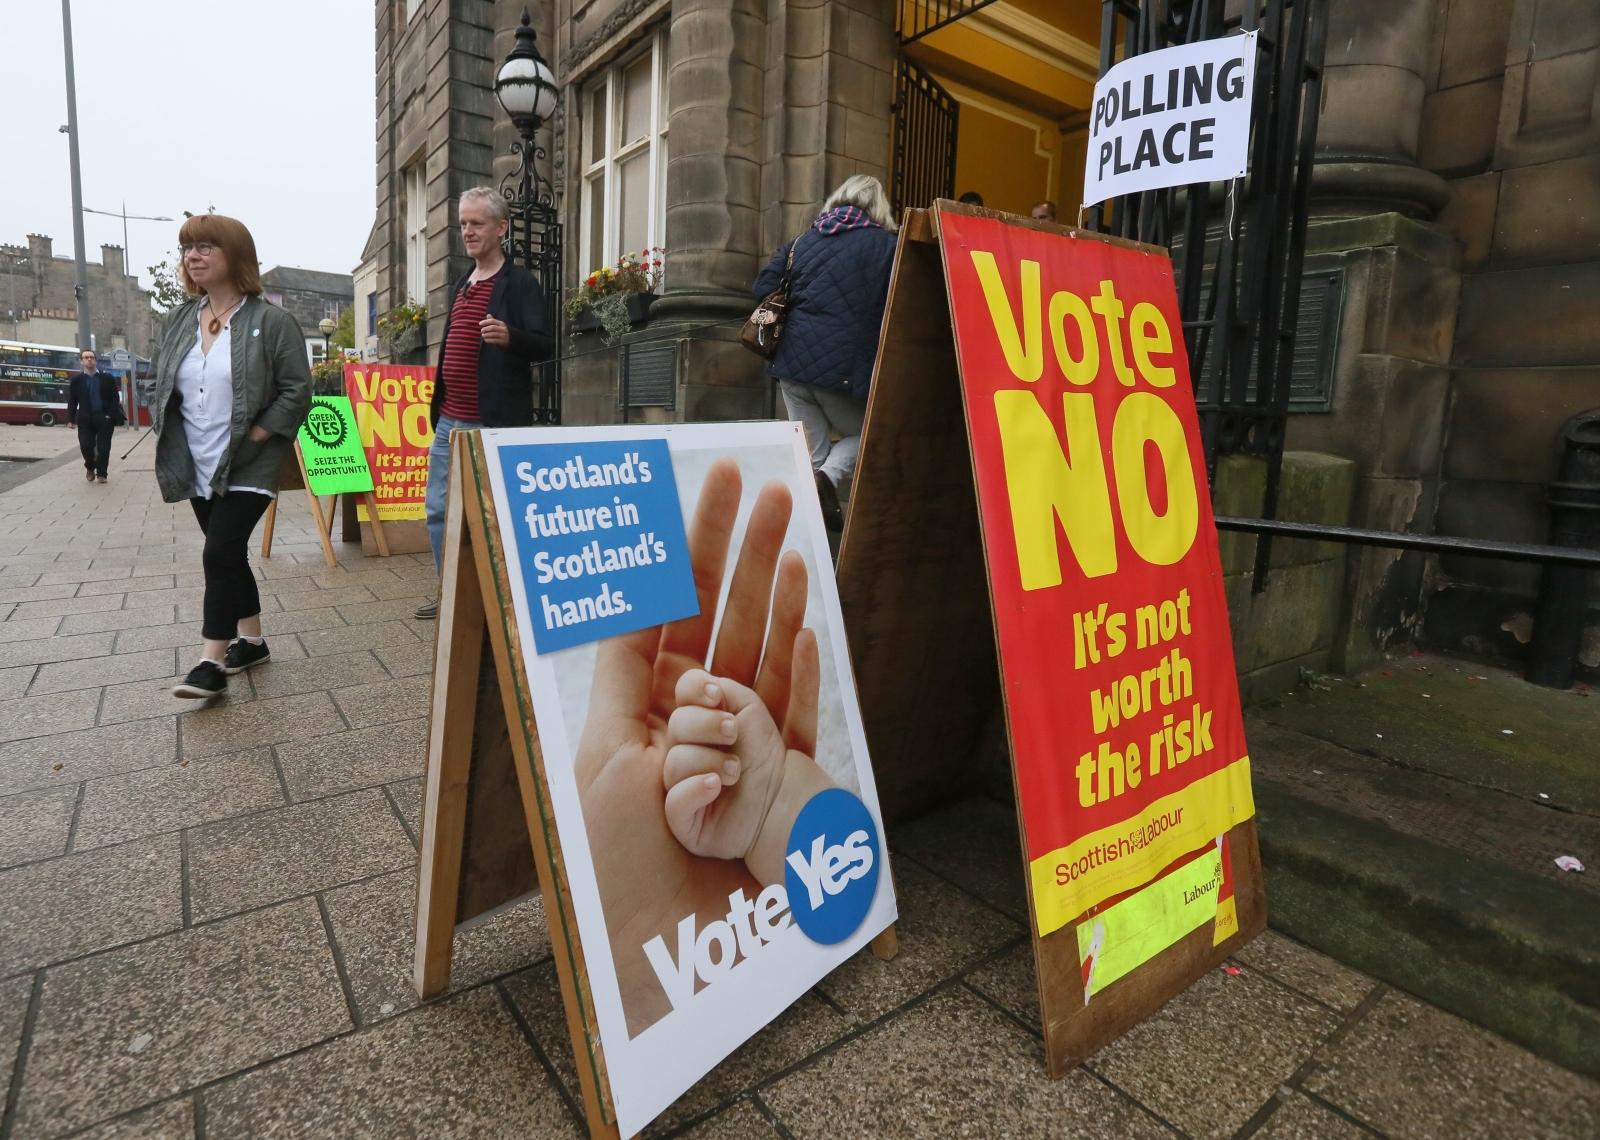 Edinburgh polling station